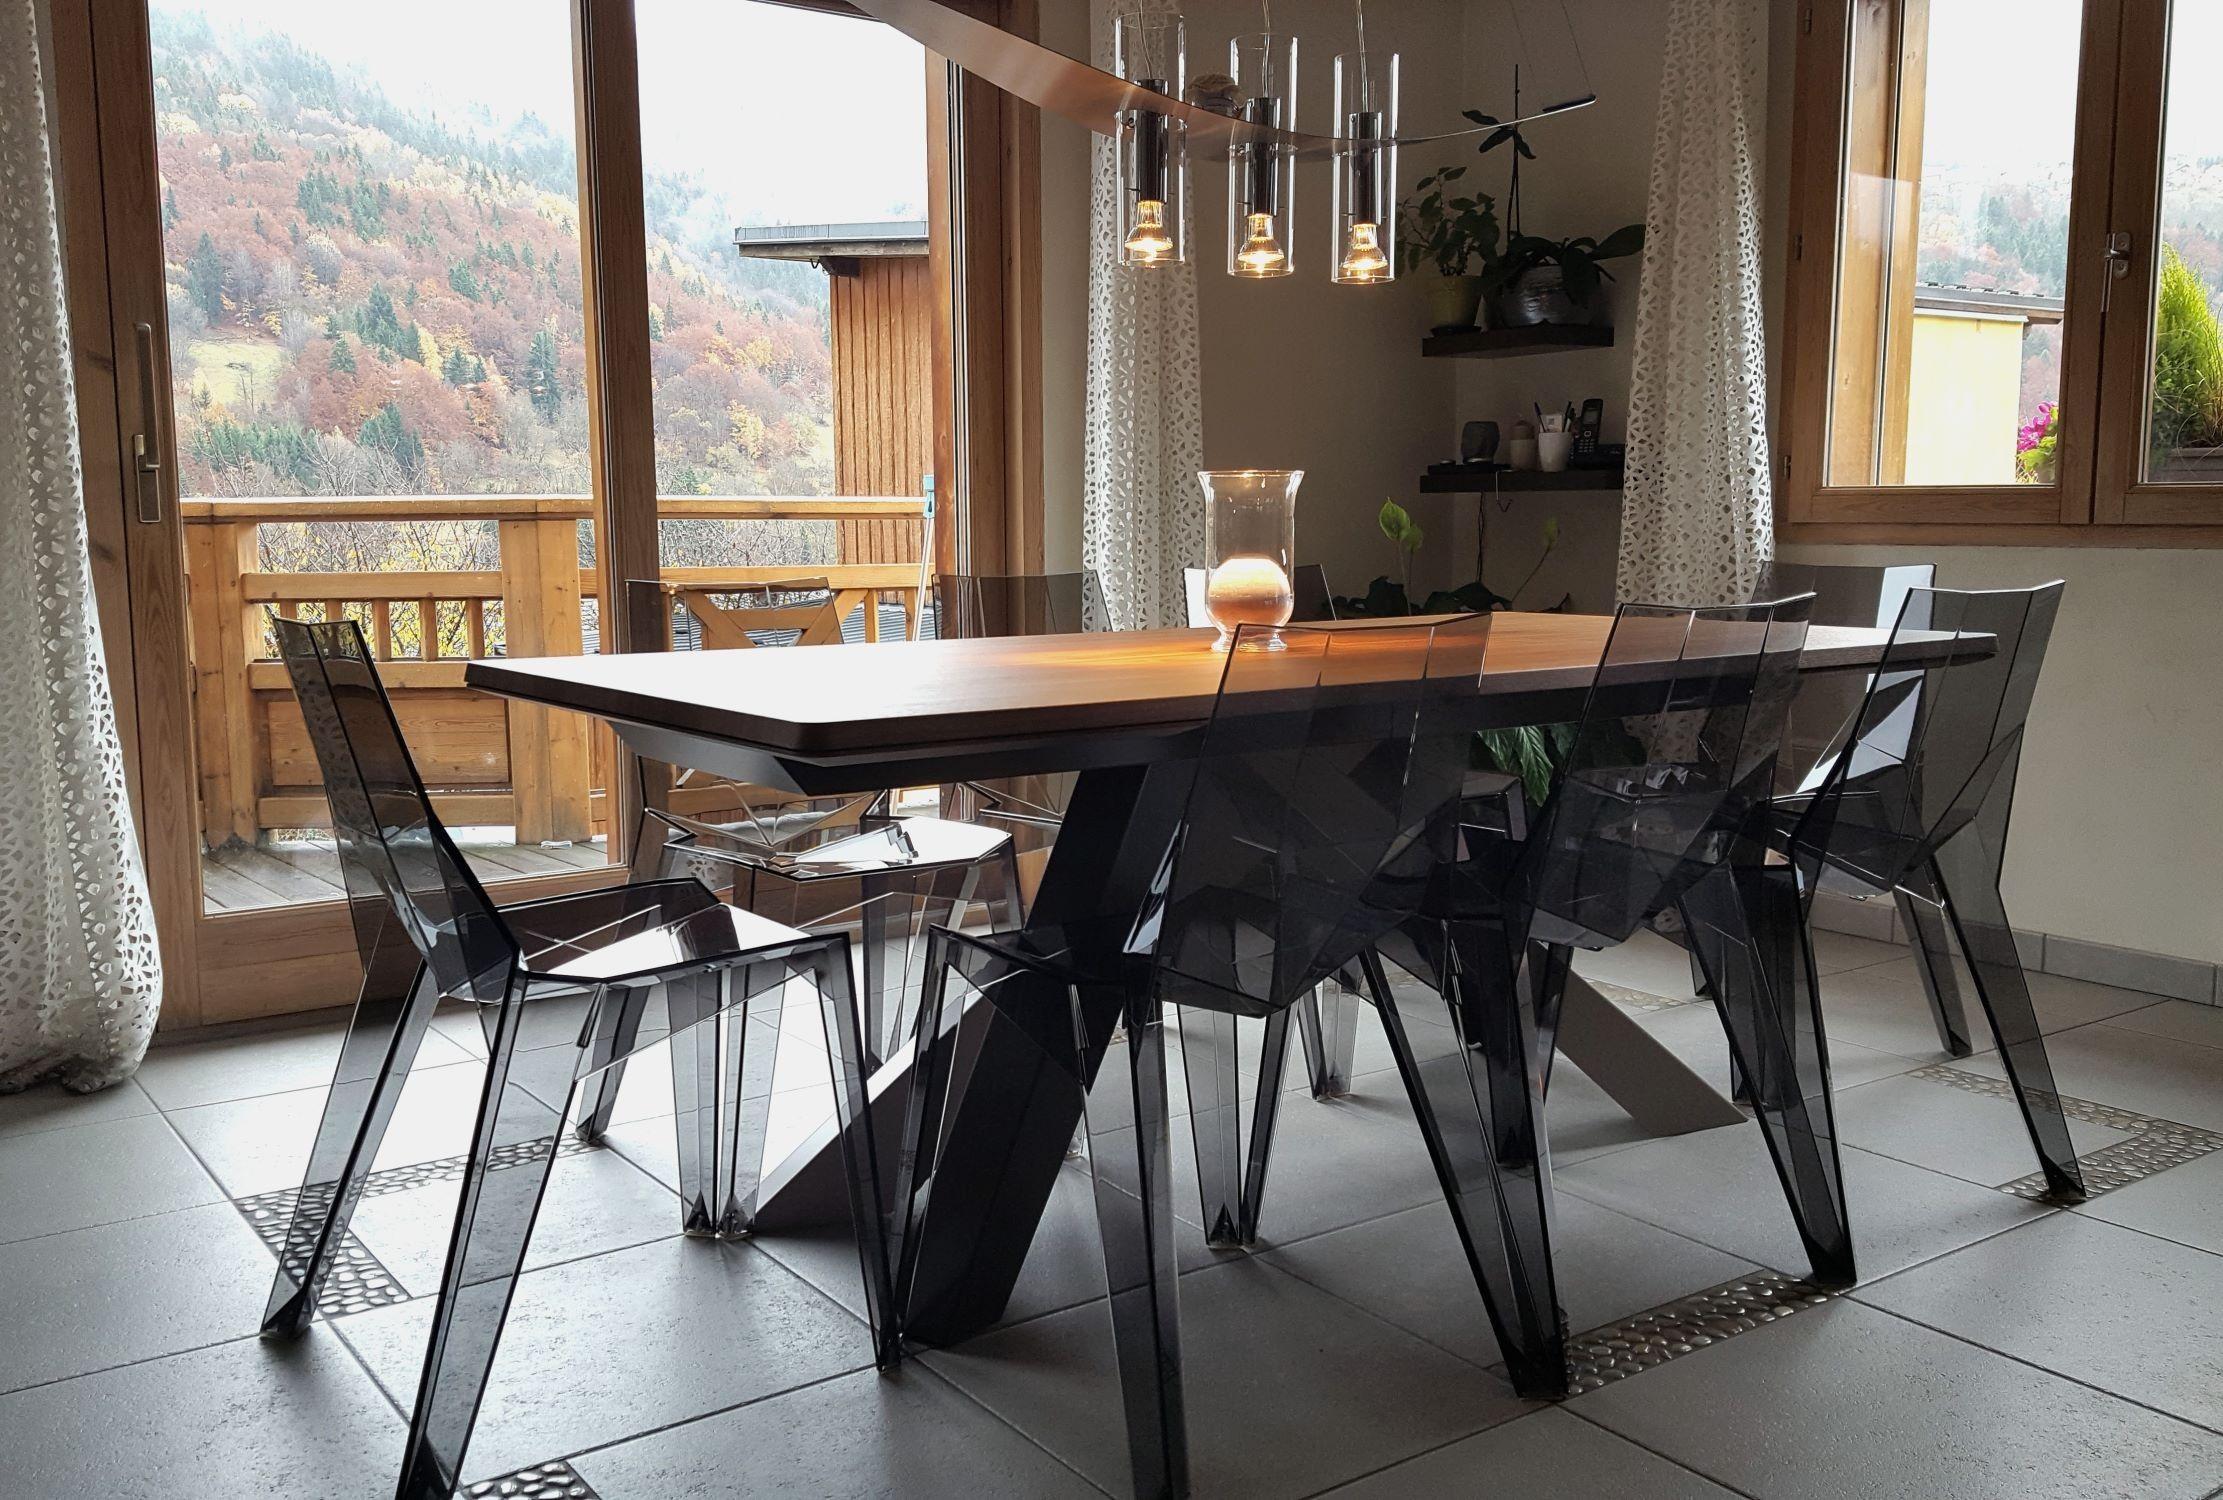 Tavolo con gambe colorate big table di bonaldo arredaclick tavoli cattelan pinterest - Tavolo bonaldo big table ...